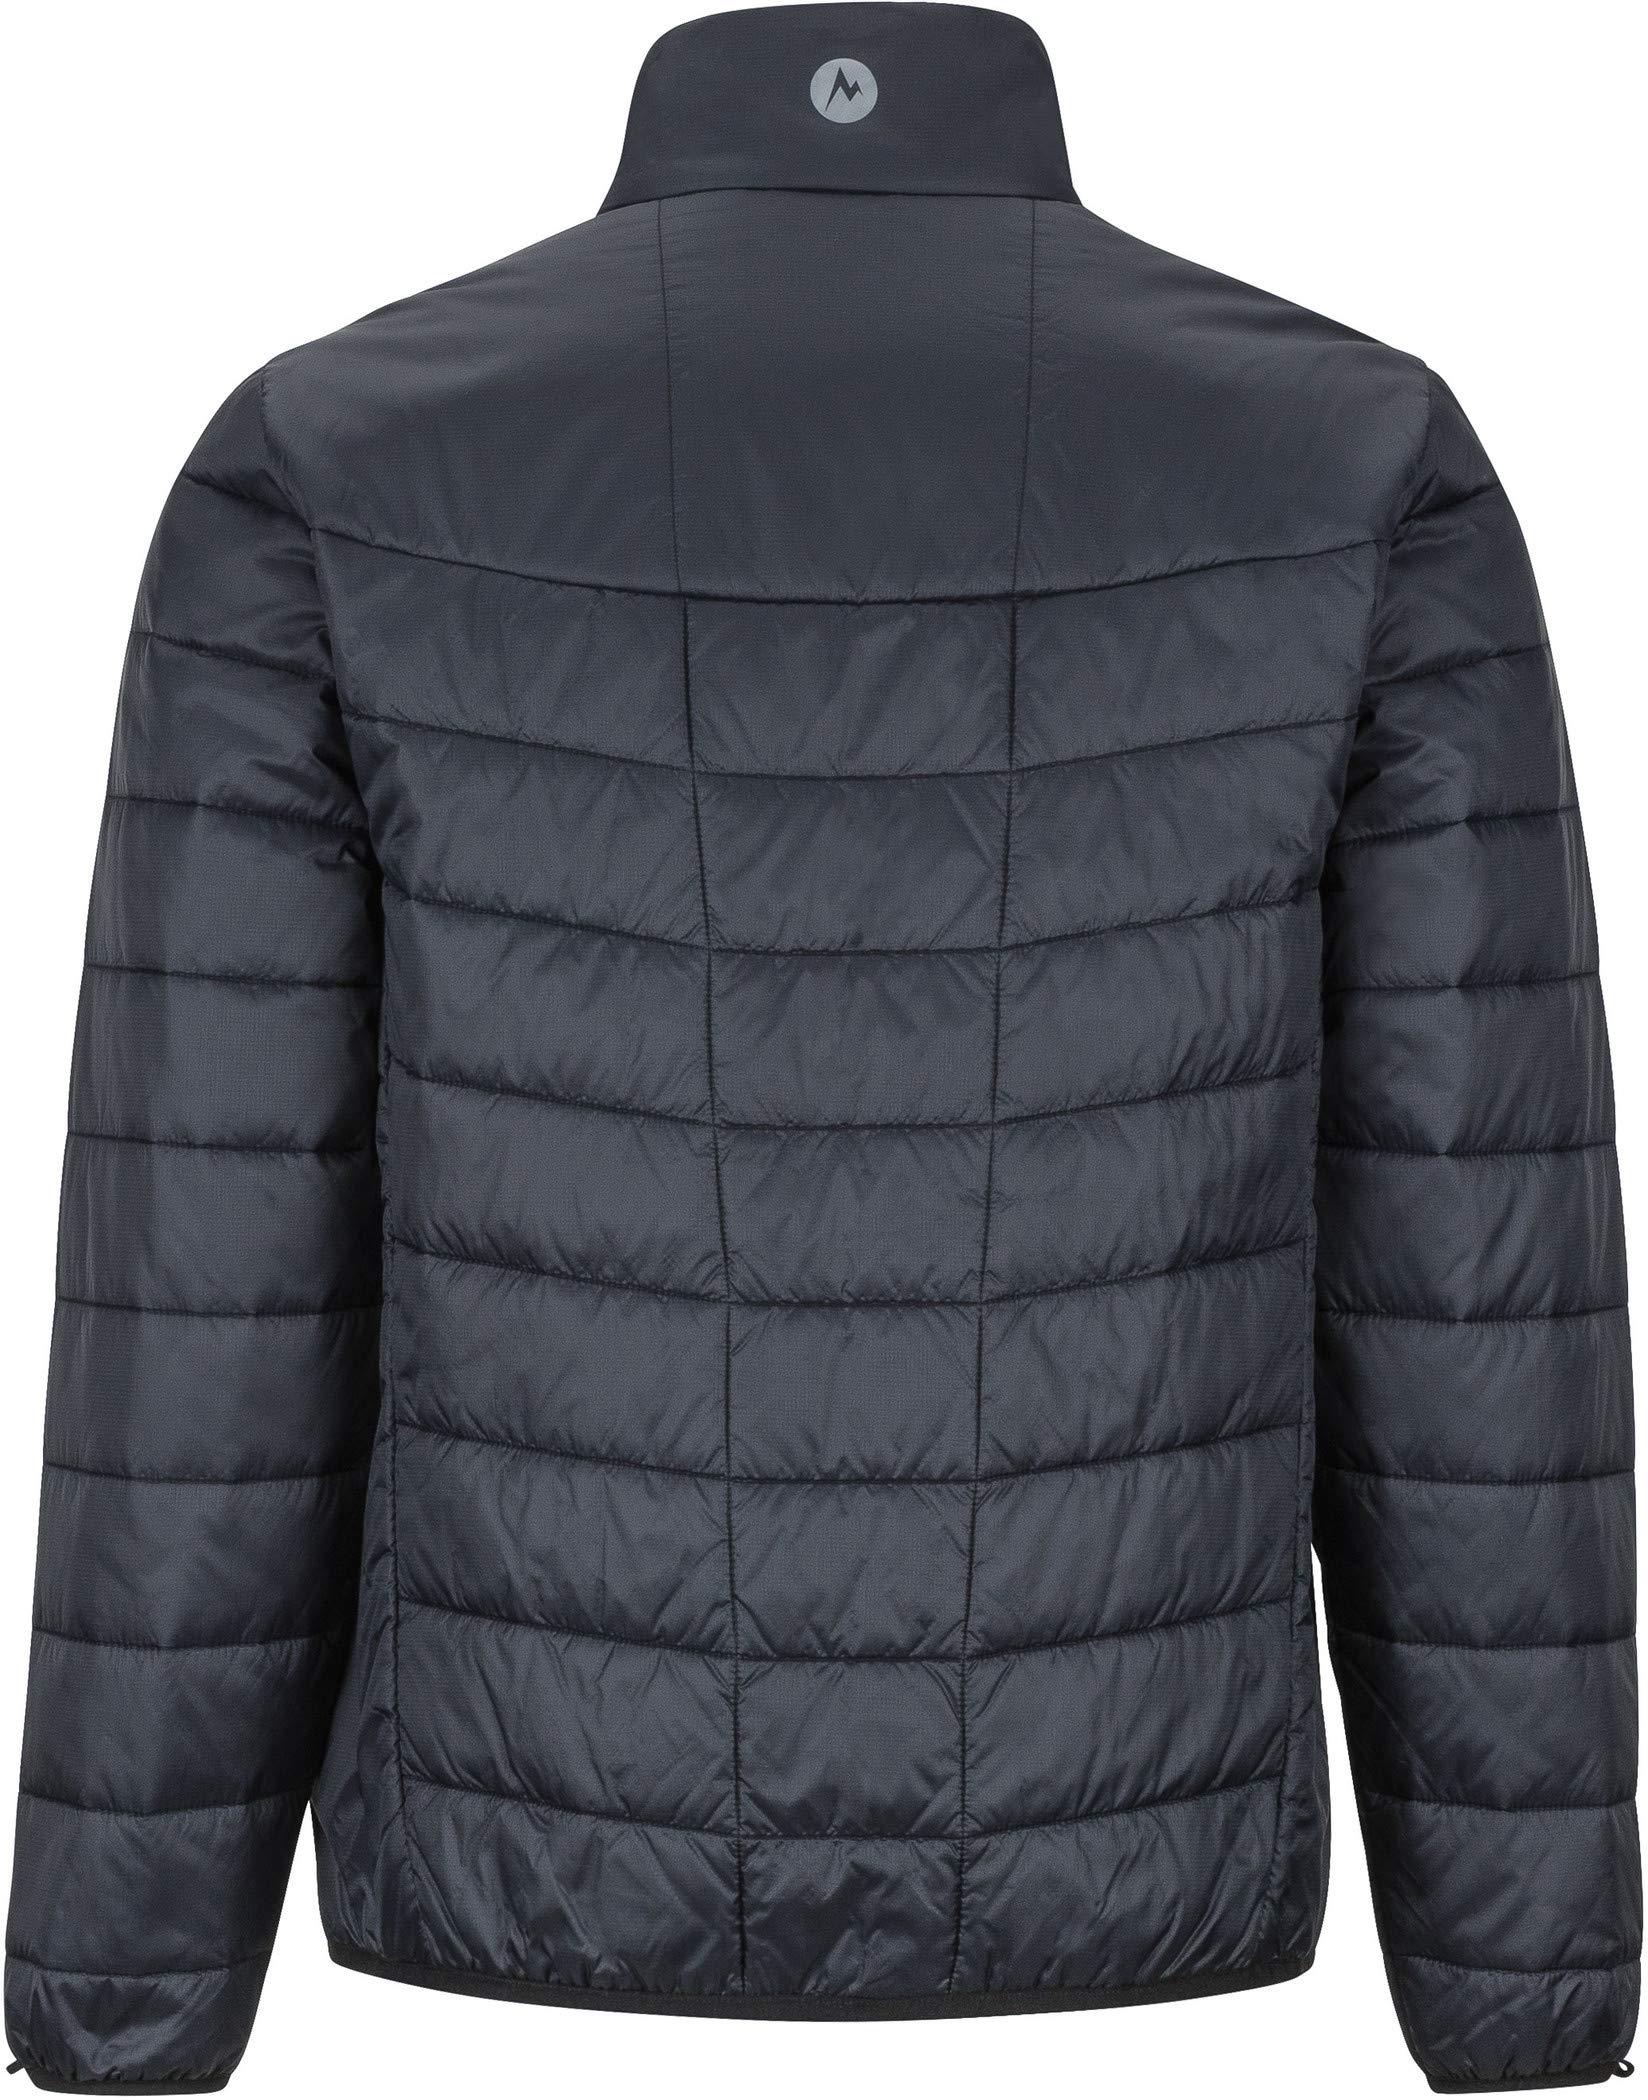 81TOuMEXYuL - Marmot Children's Minimalist Component' Jacket